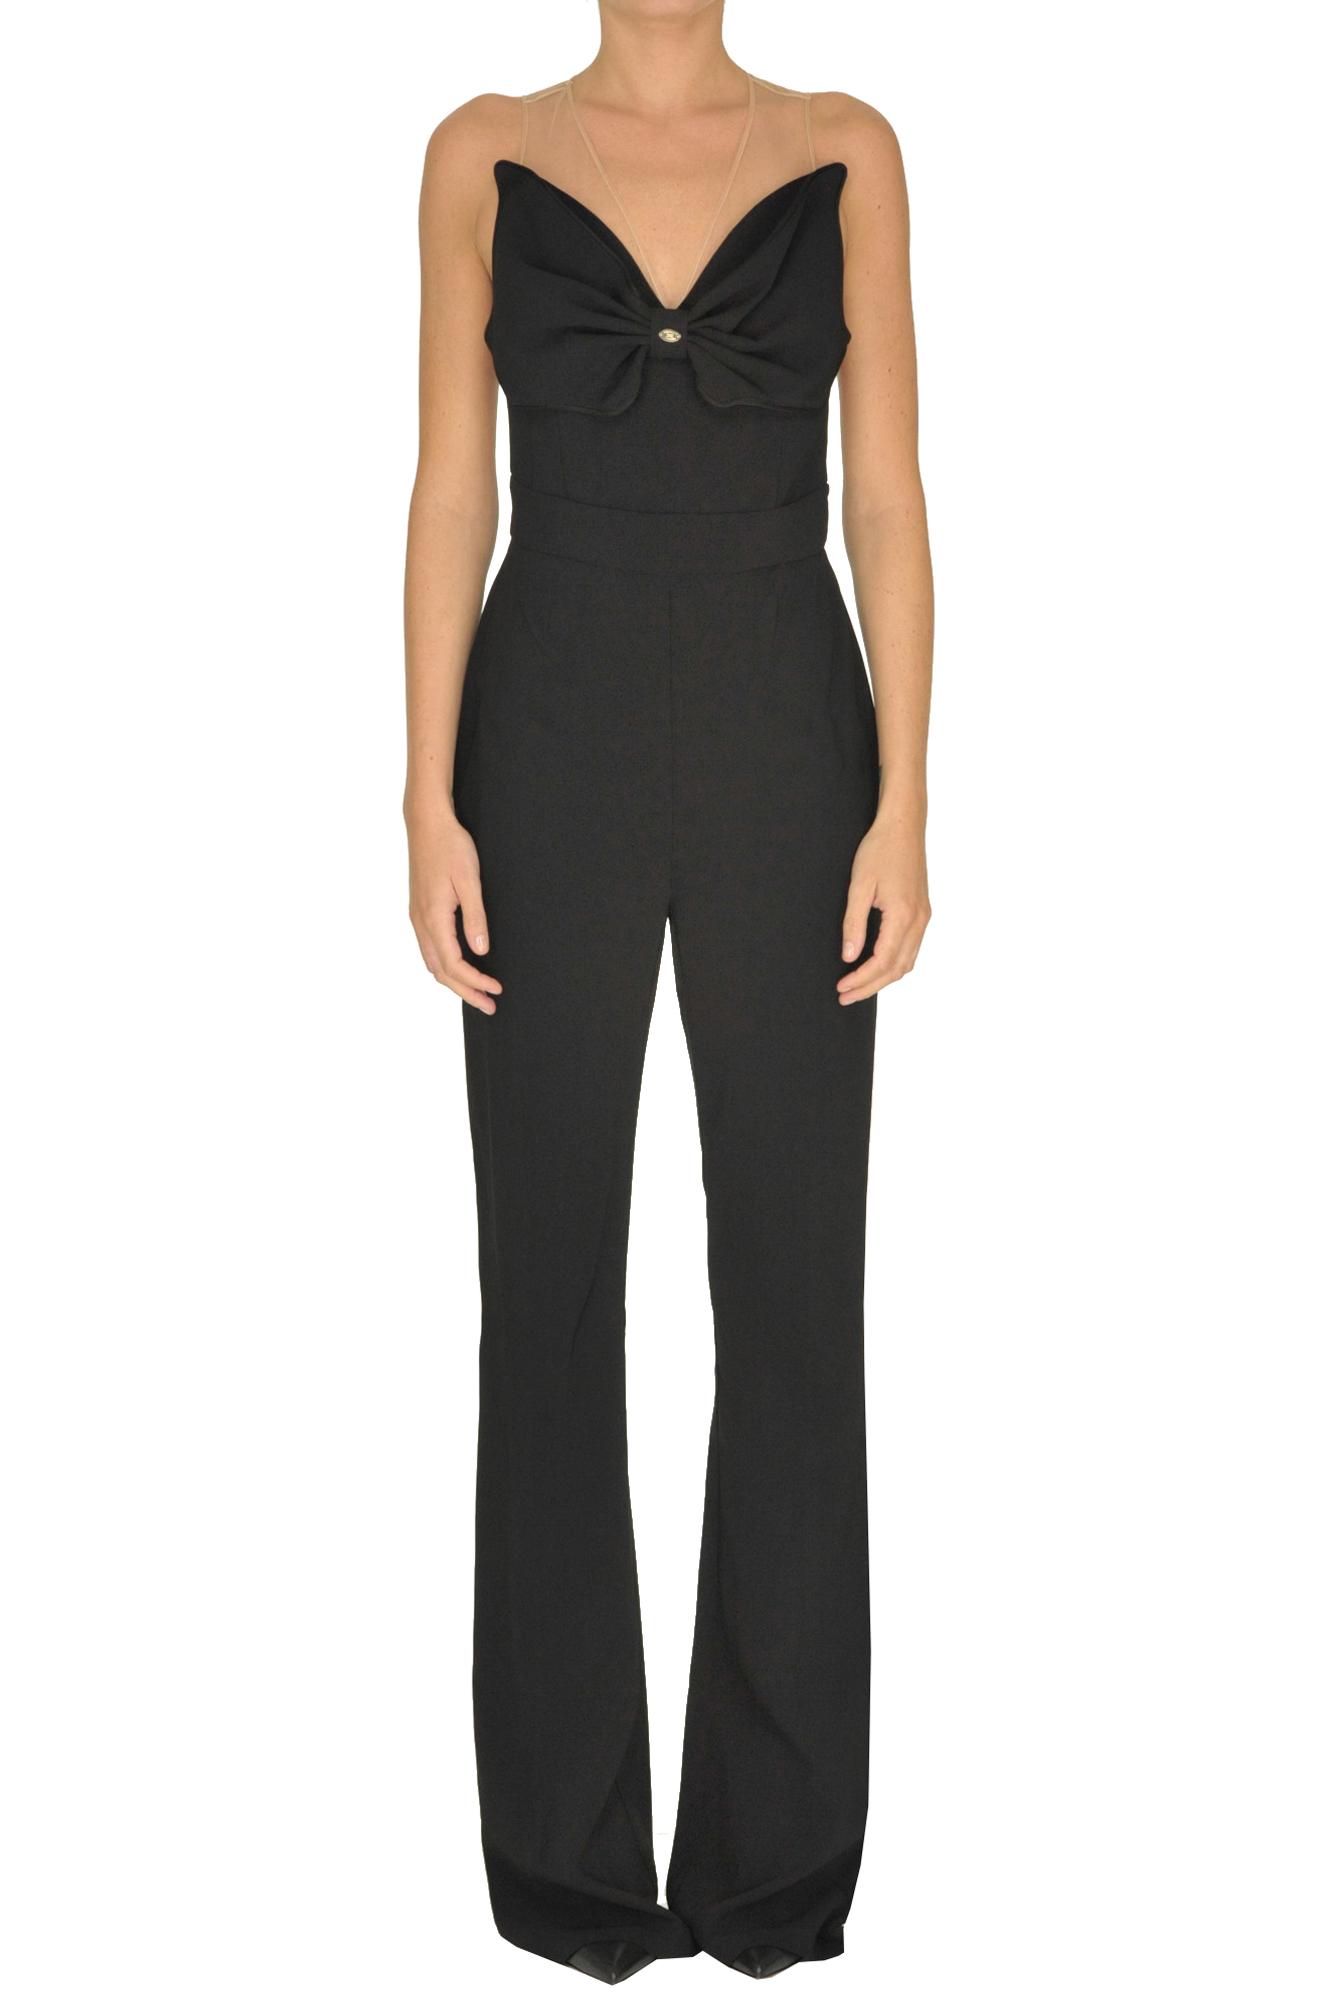 b6848df83550 Elisabetta Franchi Maxi bow jumpsuit - Buy online on Glamest.com ...